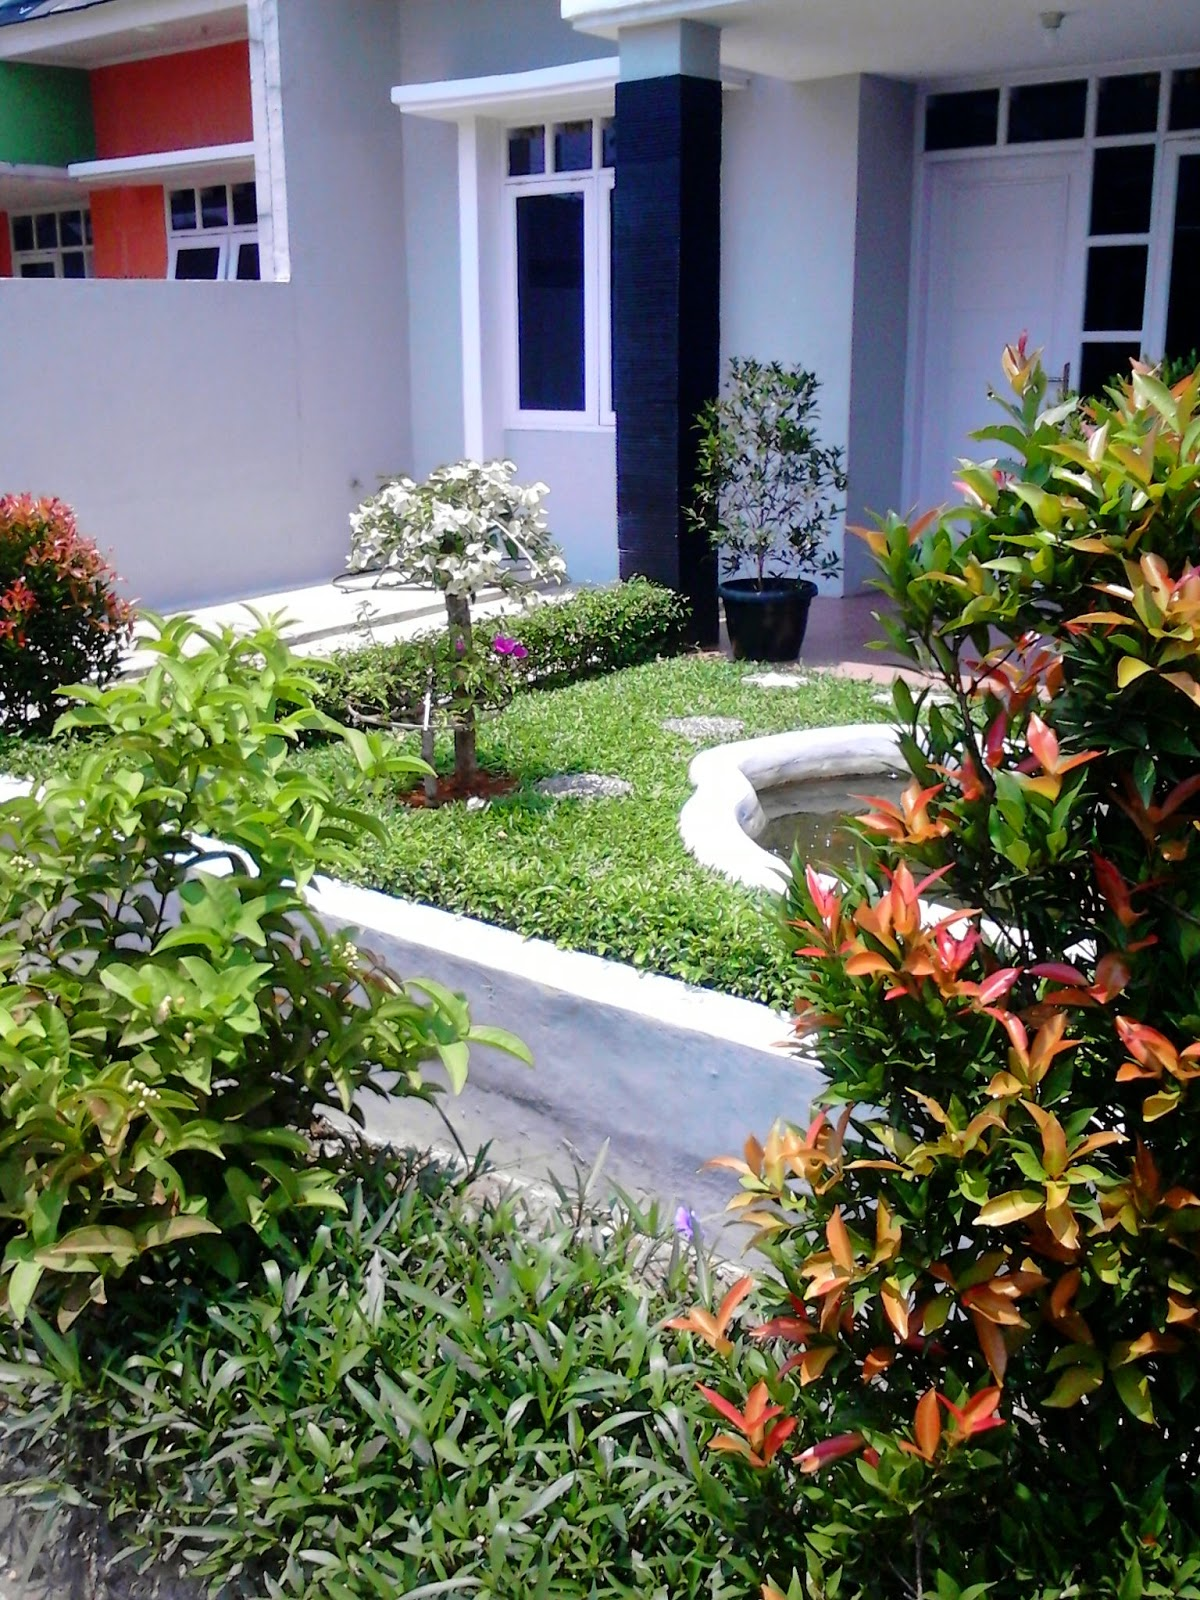 Jasa pembuatan taman rumahan | jasa desain taman | jasa tanam rumput | suplier tanaman